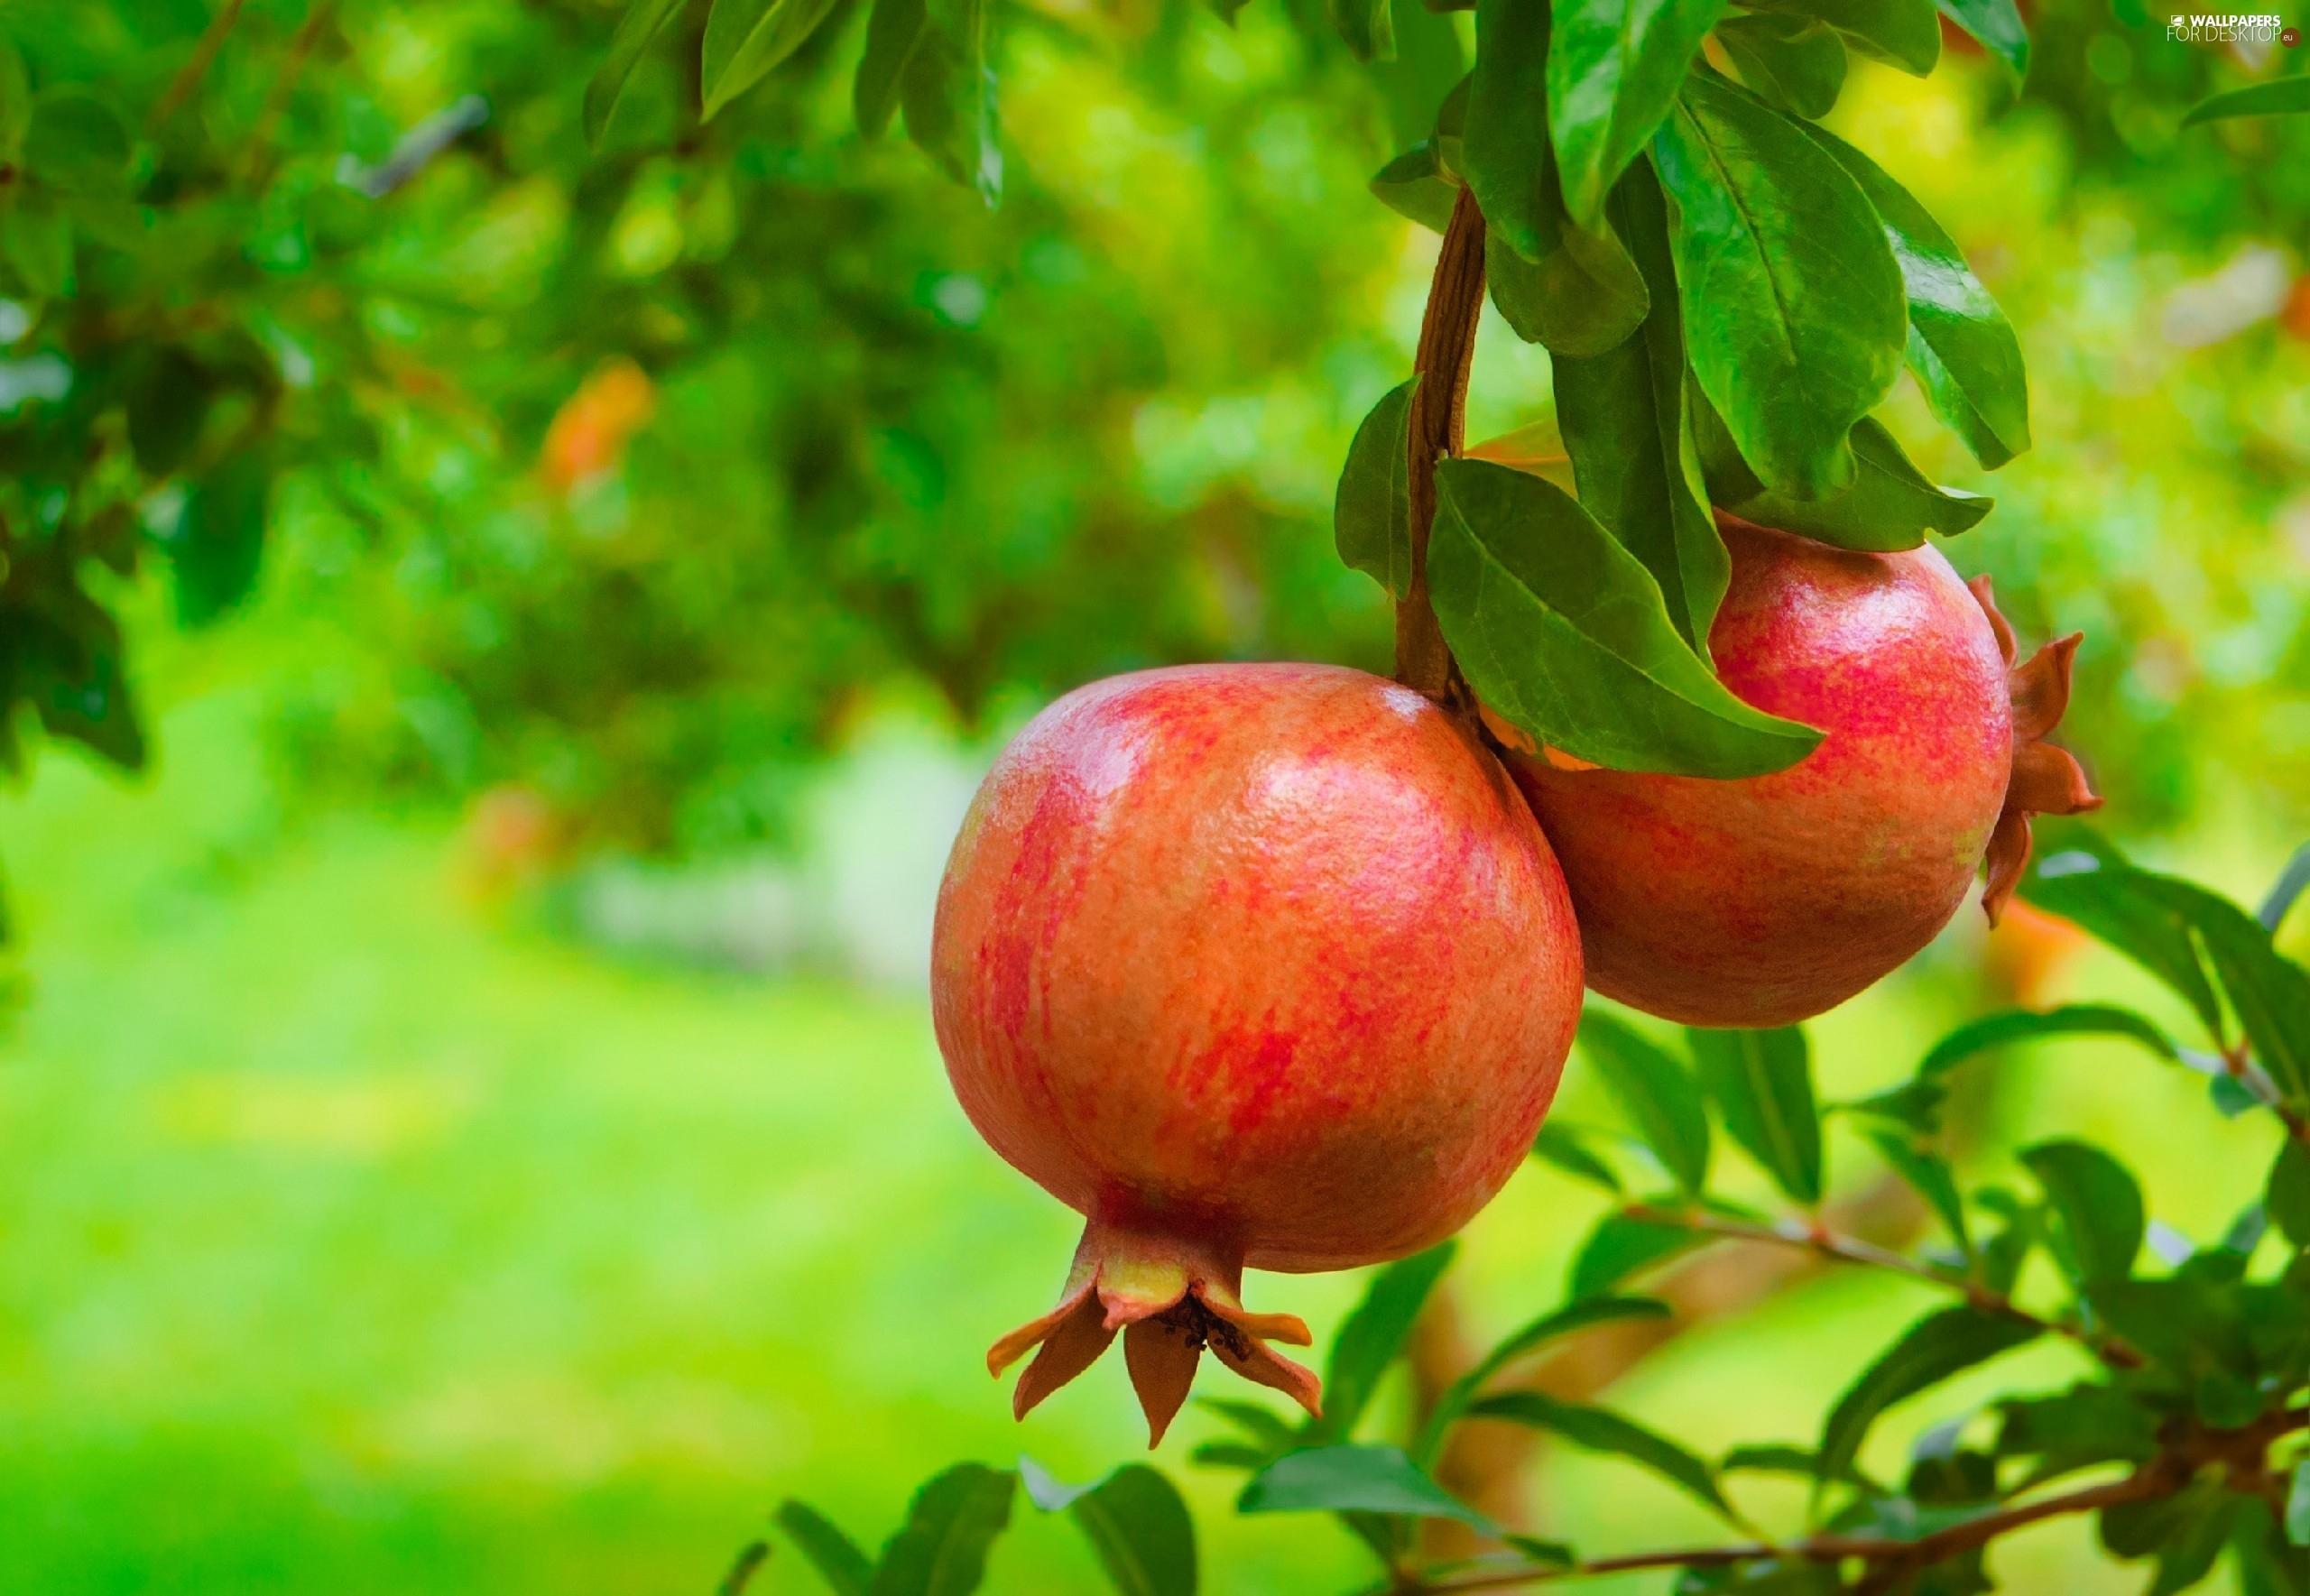 Fruit tree wallpaper desktop - Backgrounds 2560x1769 Granatu Fruits Garden Trees